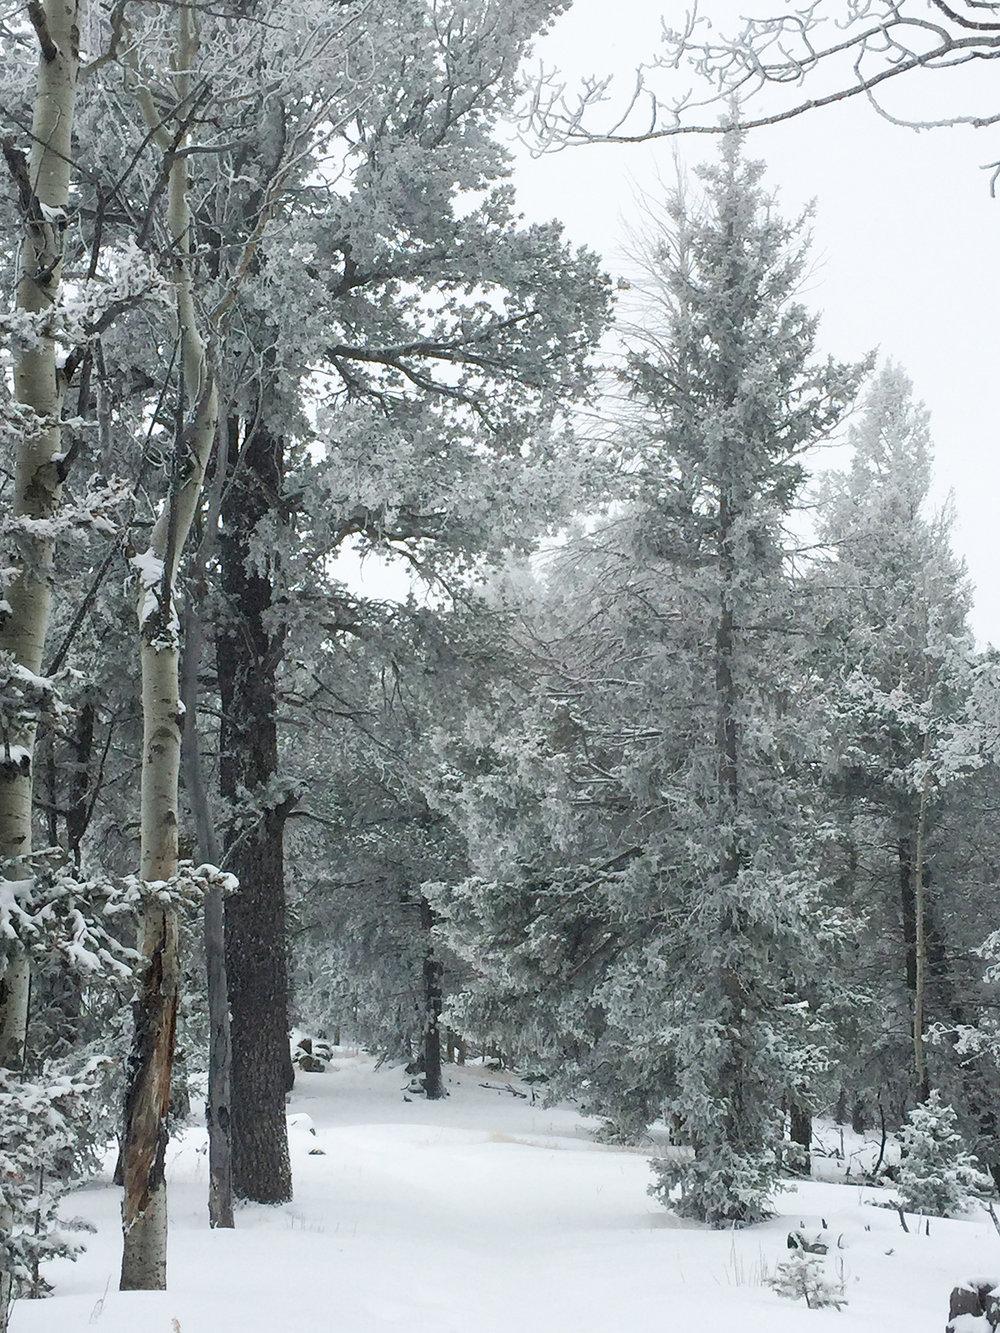 My next attempt - photo taken at Mueller State Park near Divide, Colorado